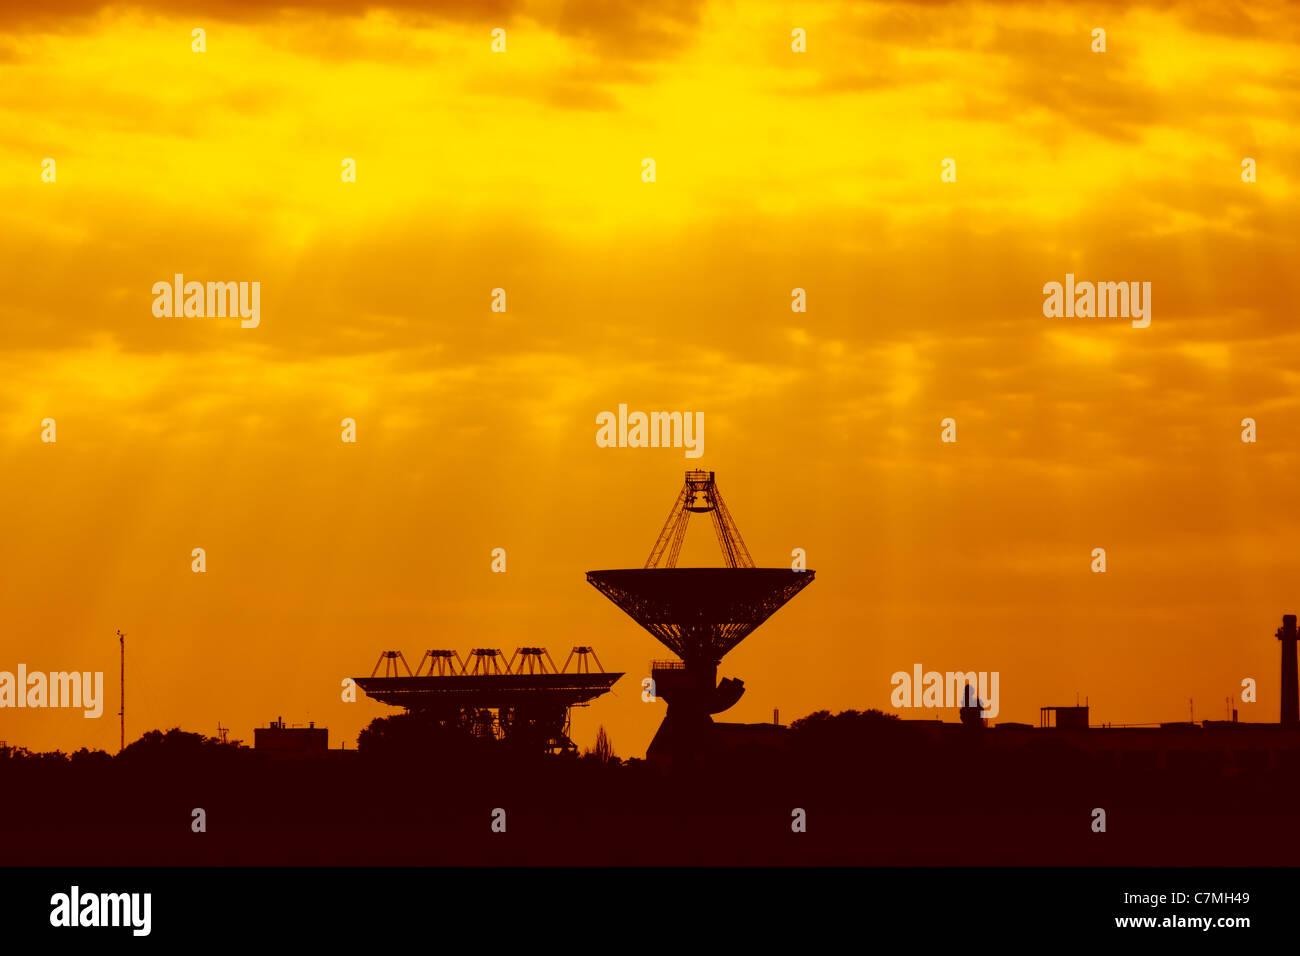 Antenas para comunicaciones espaciales al atardecer. Centro Espacial de Ucrania Imagen De Stock